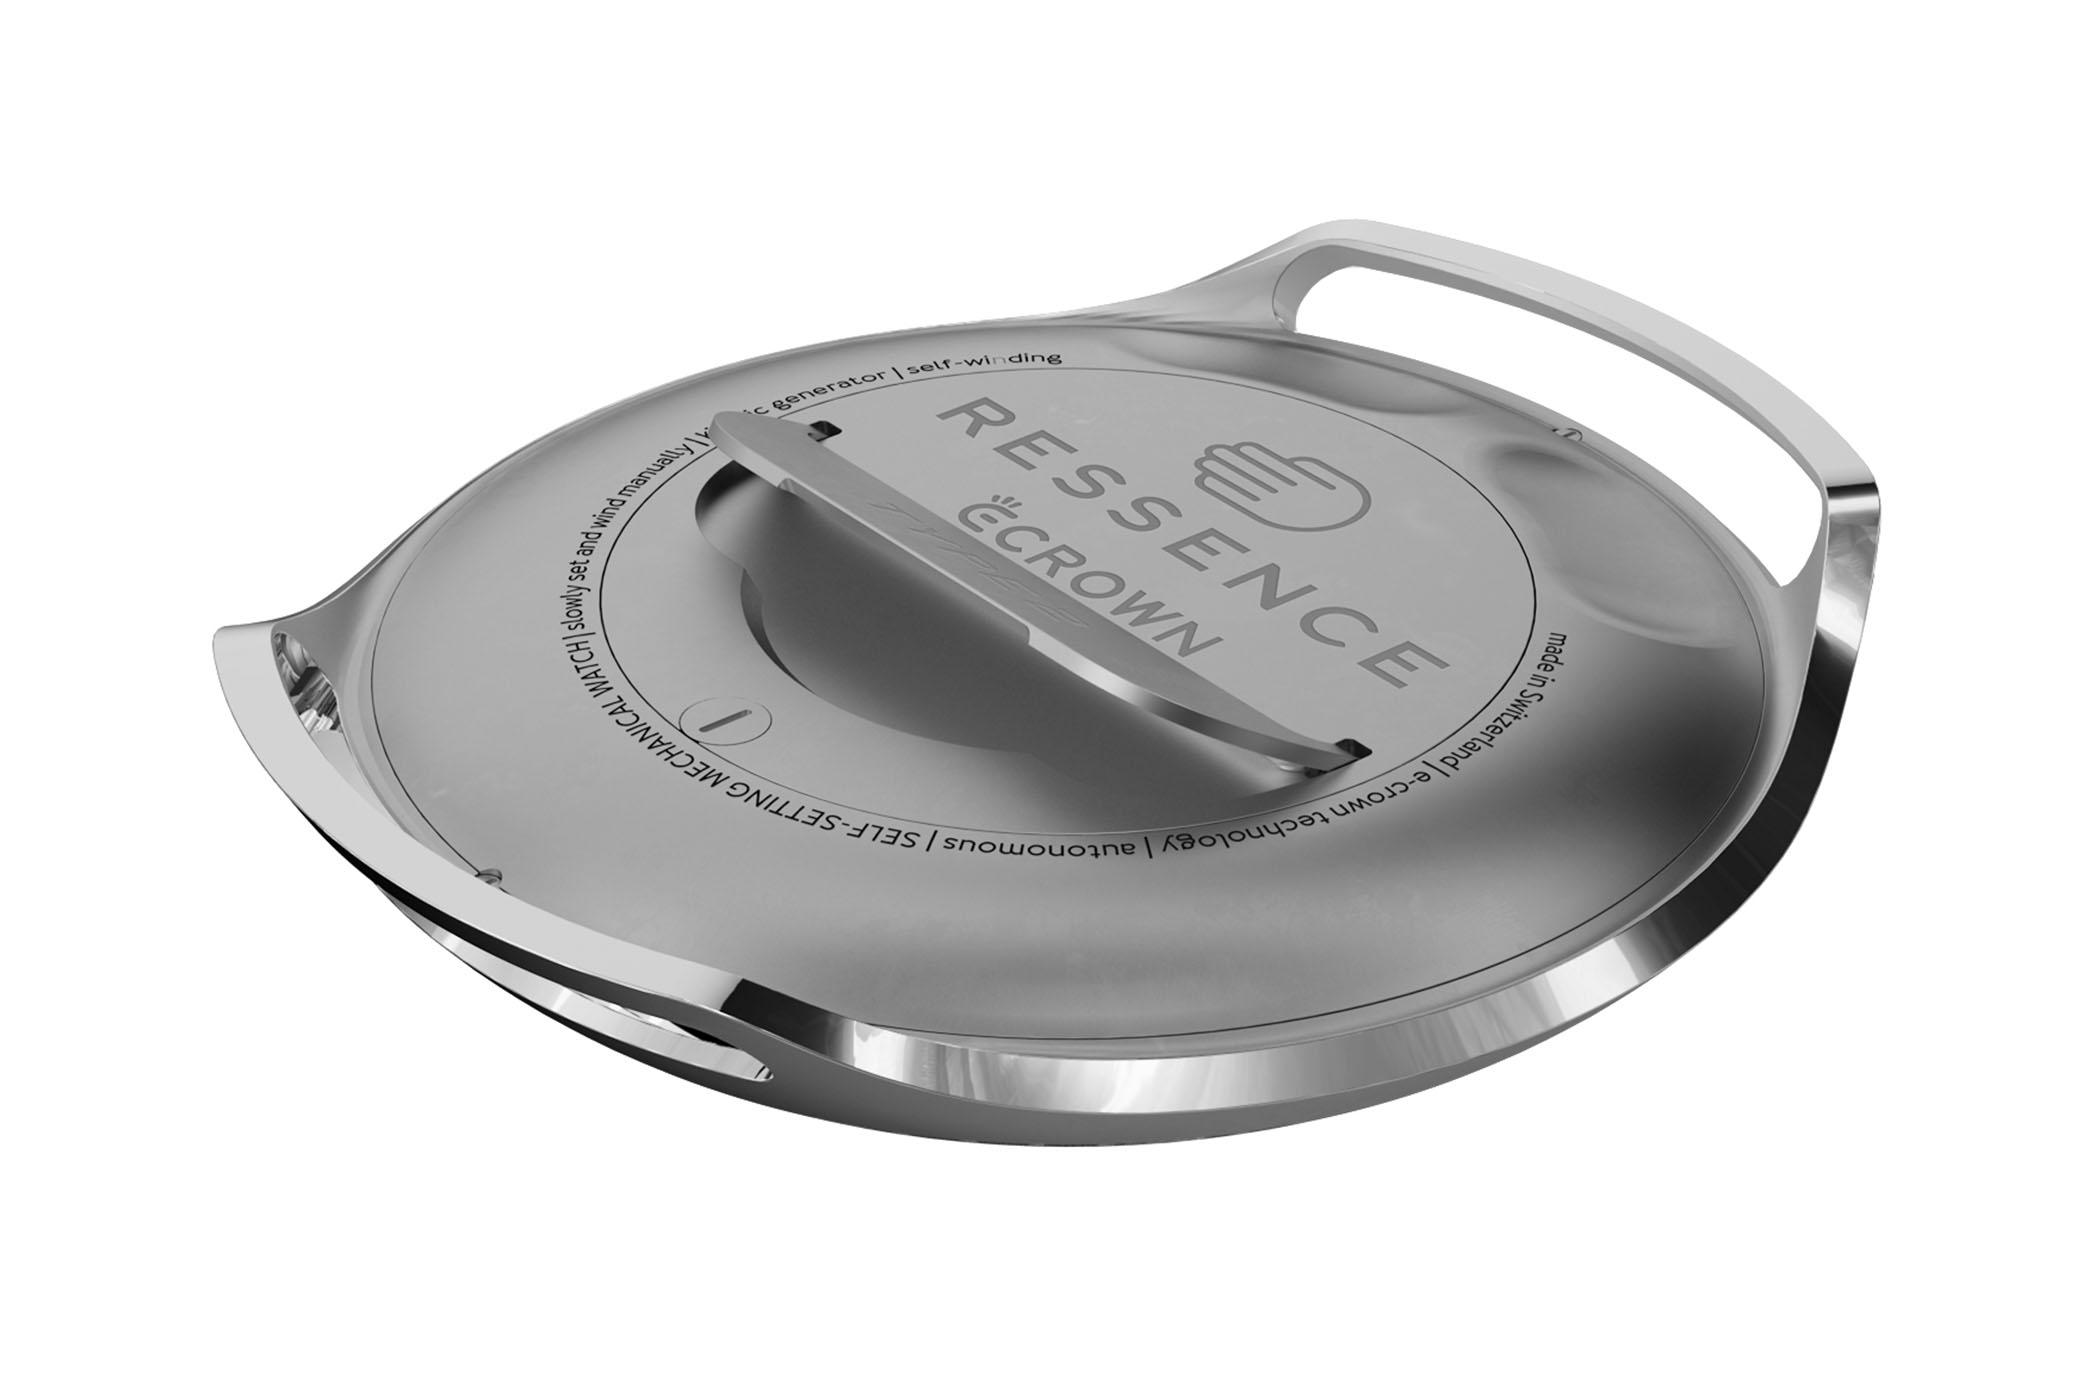 Ressence Type 2 E-Crown - first self-setting mechanical watch